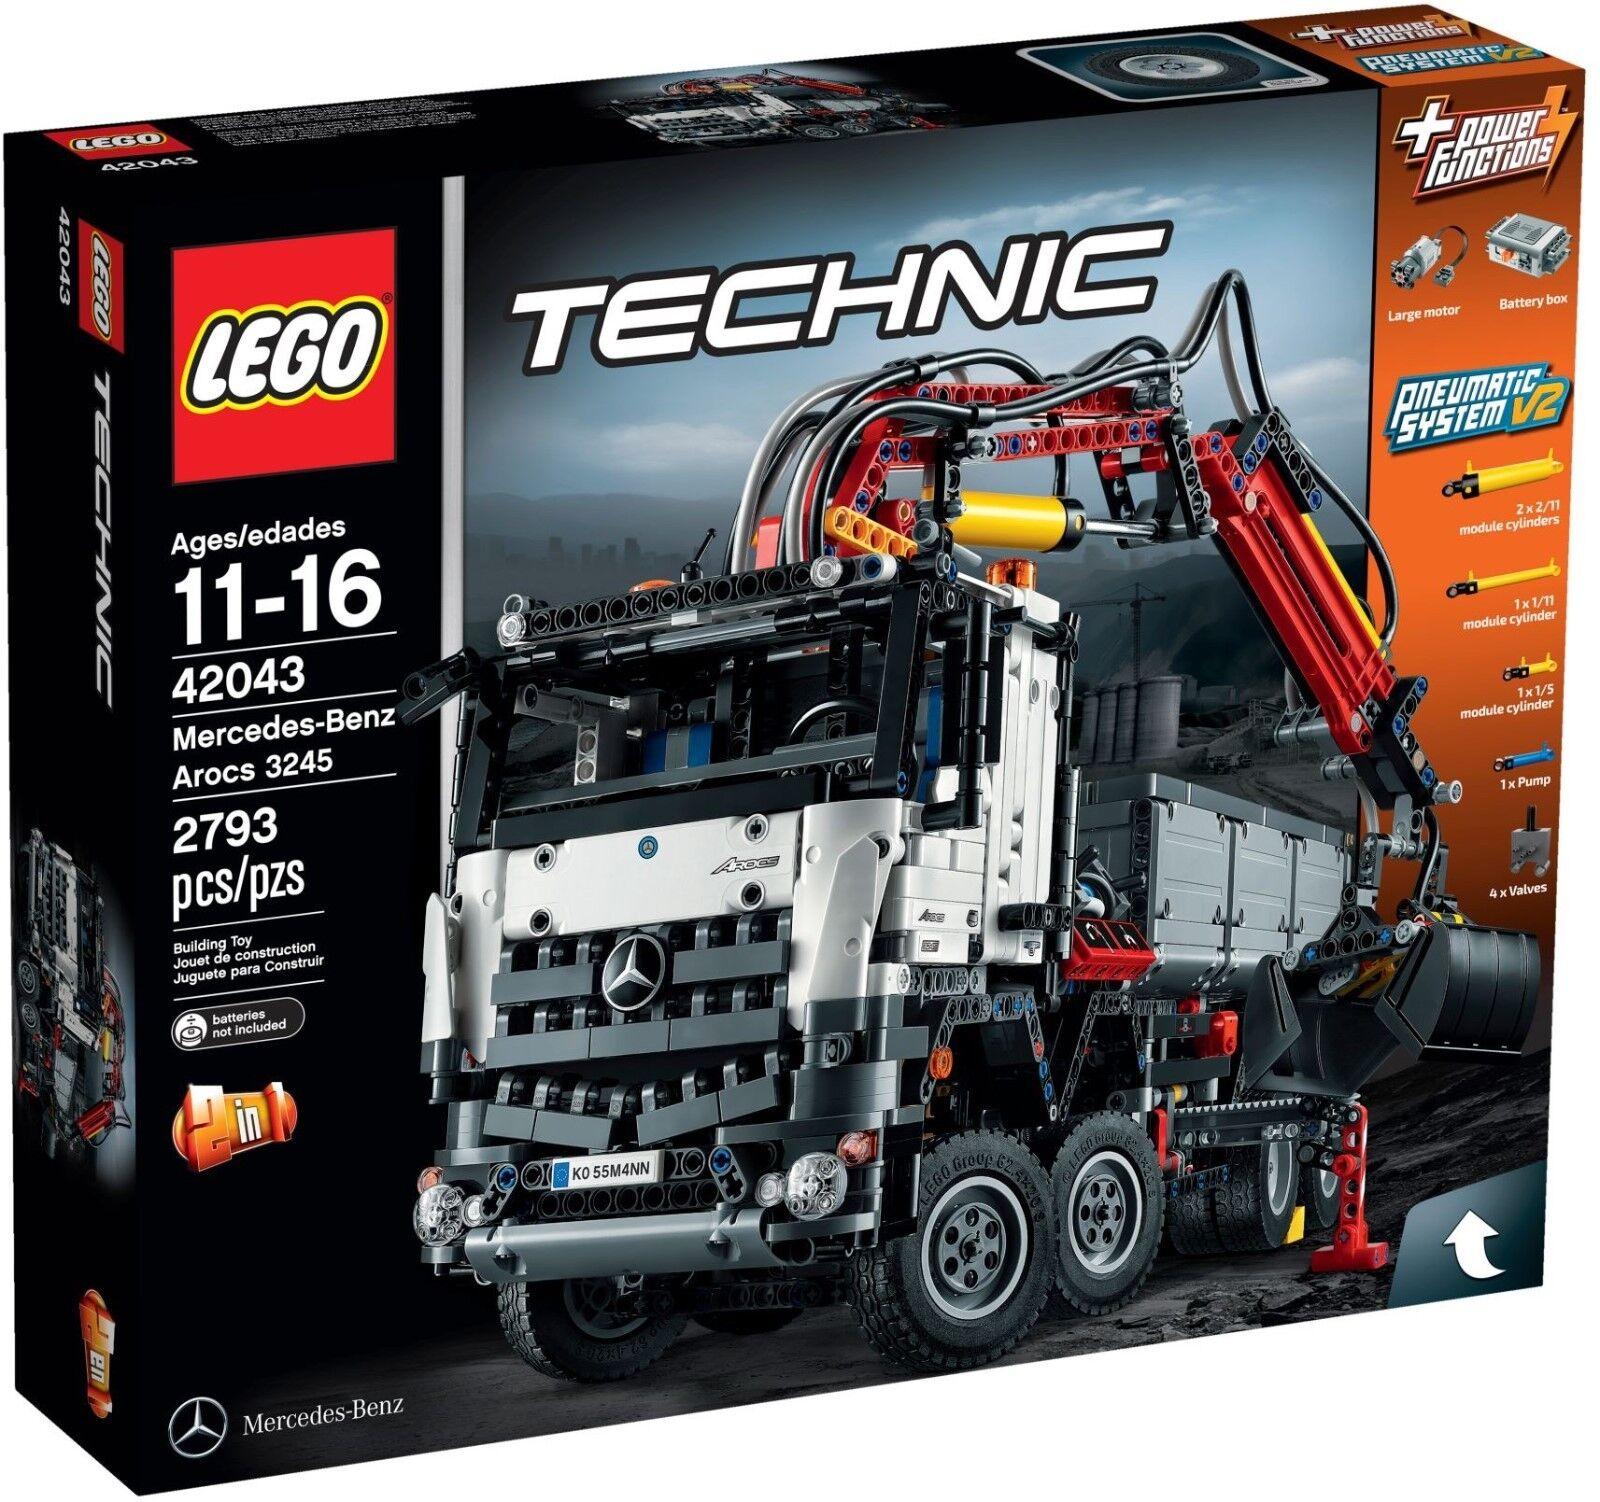 LEGO 42043 Technic Mercedes-Benz Arocs 3245 Brand NEW_2D